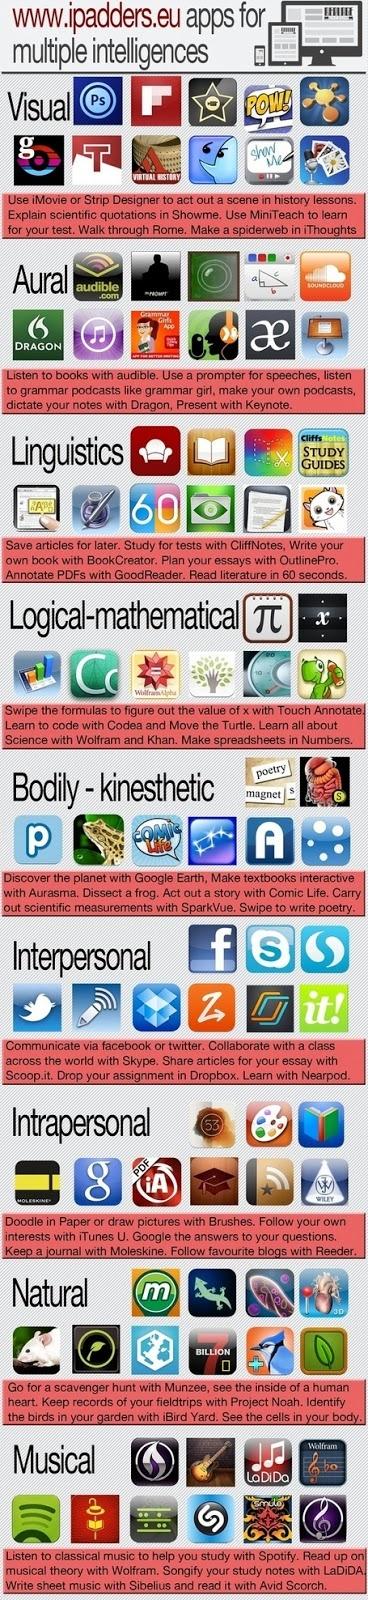 #inteligenciasmultiples #imagen app para desarrollar las inteligencias multiples